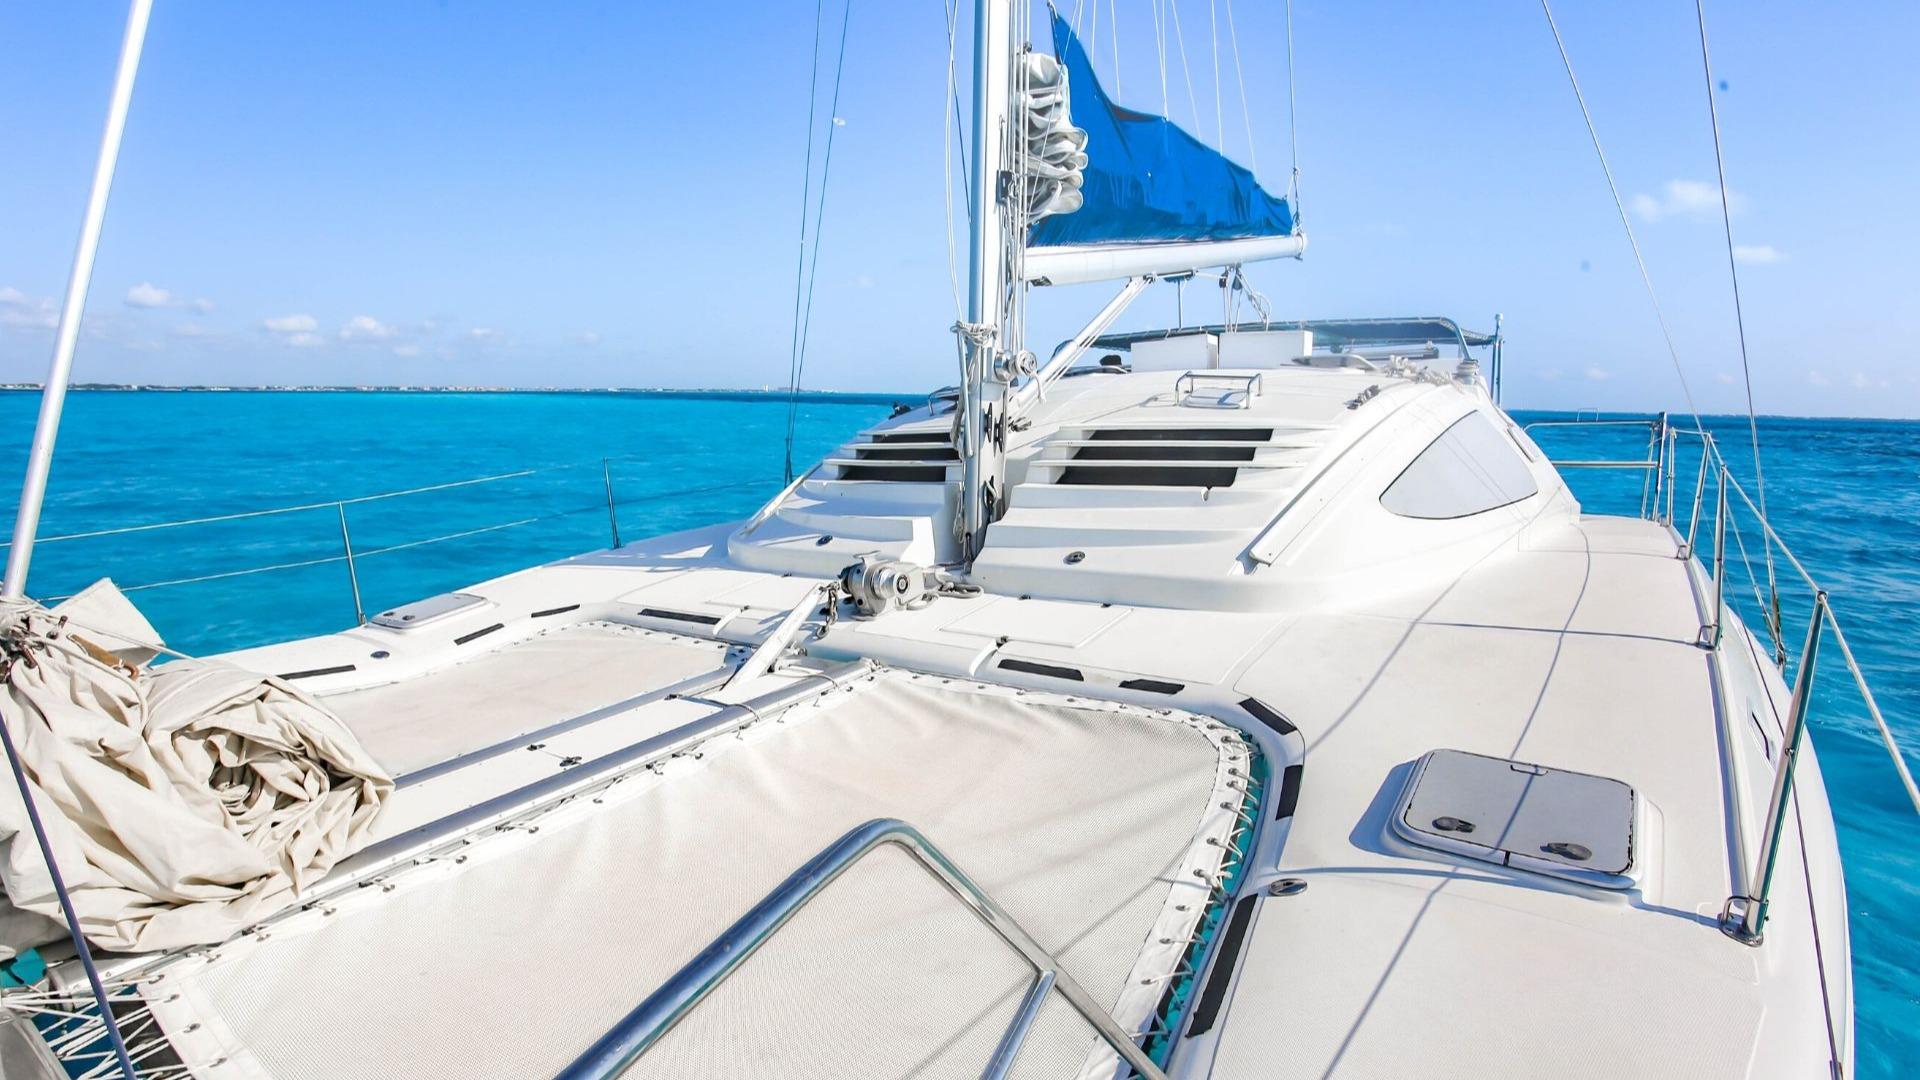 7 - LowRes - Pachanga - Private Isla Mujeres catamaran tour - Cancun Sailing